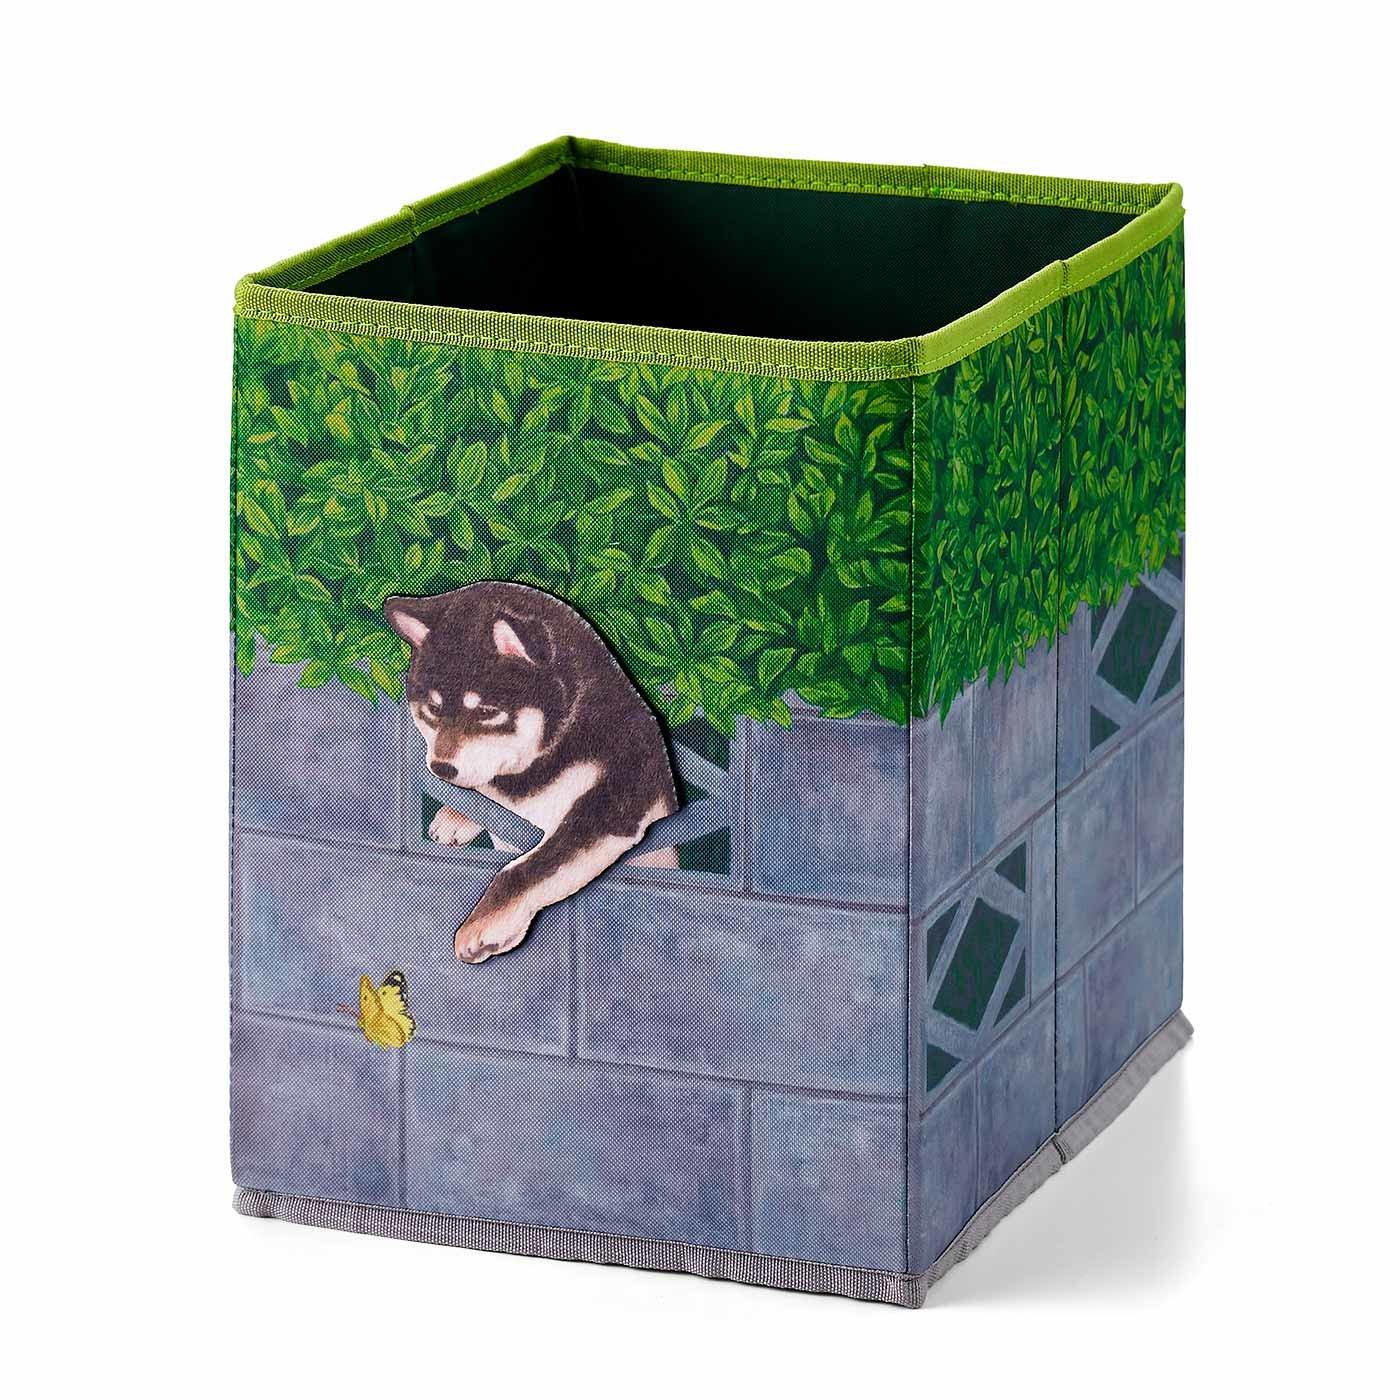 YOU+MORE! 壁からひょっこり! 好奇心旺盛な 柴犬収納ボックスの会